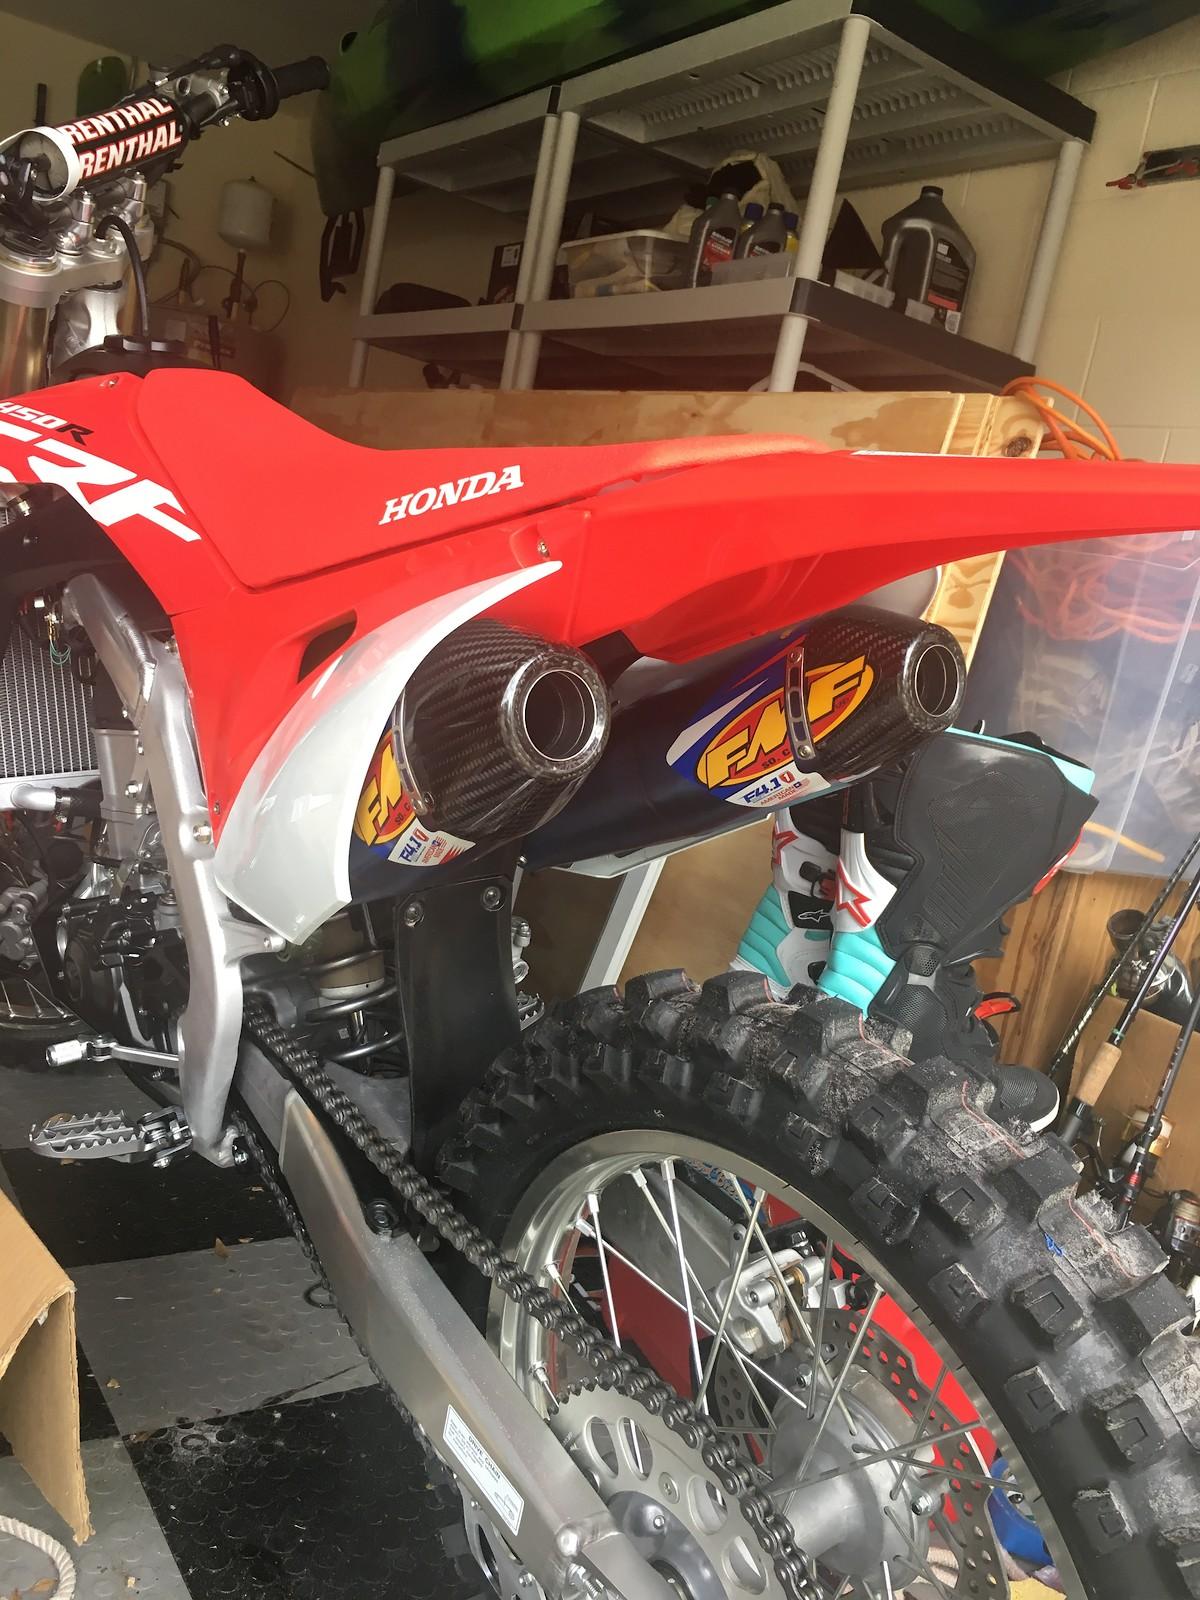 2018 Honda Crf450r Build Bike Builds Motocross Forums Message